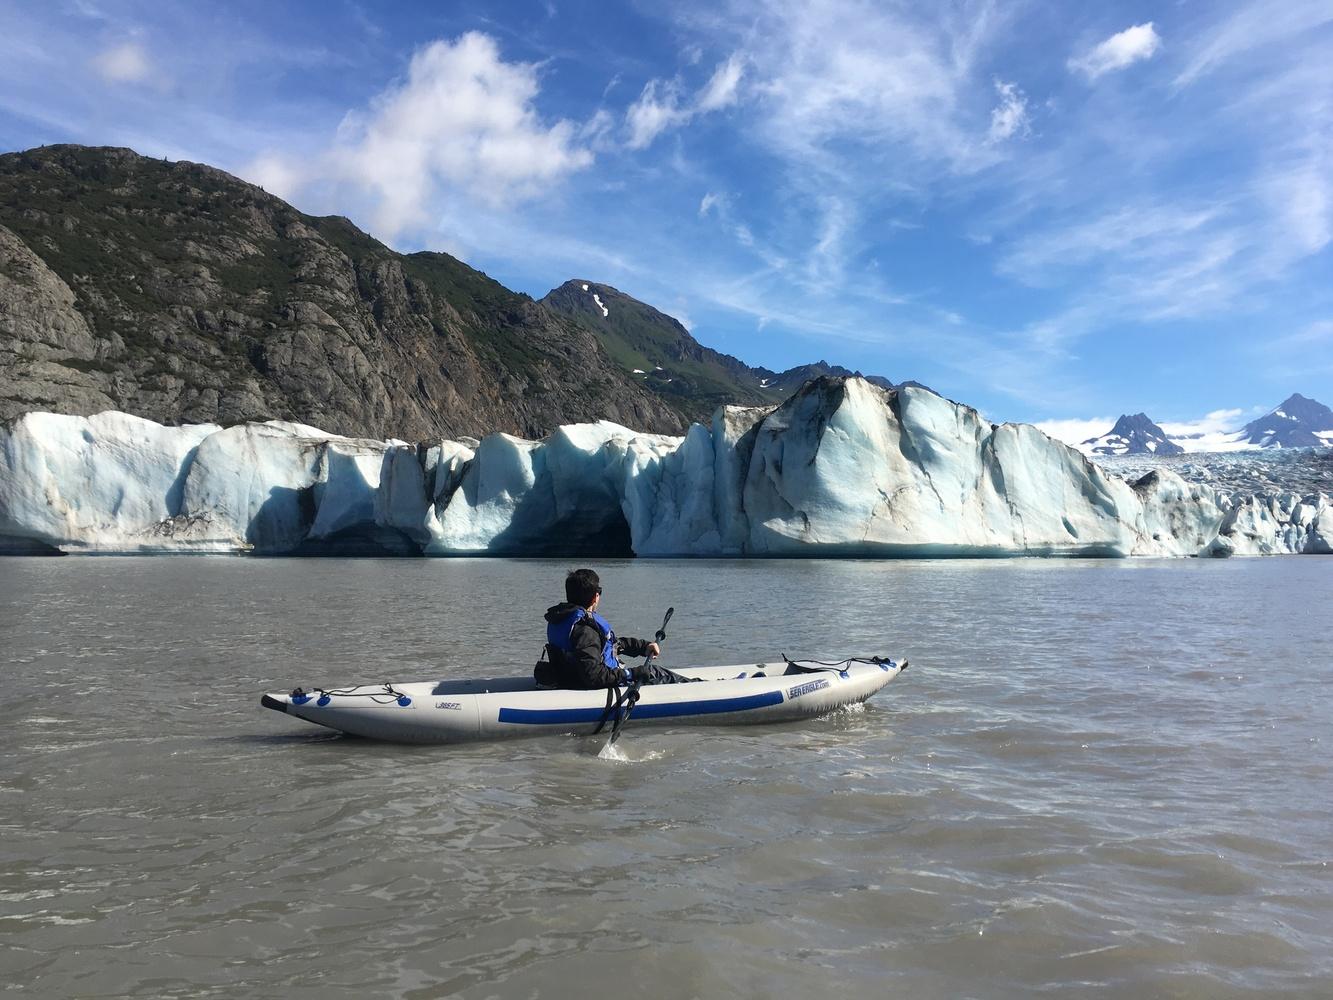 Kayaker in front of a glacier in Alaska